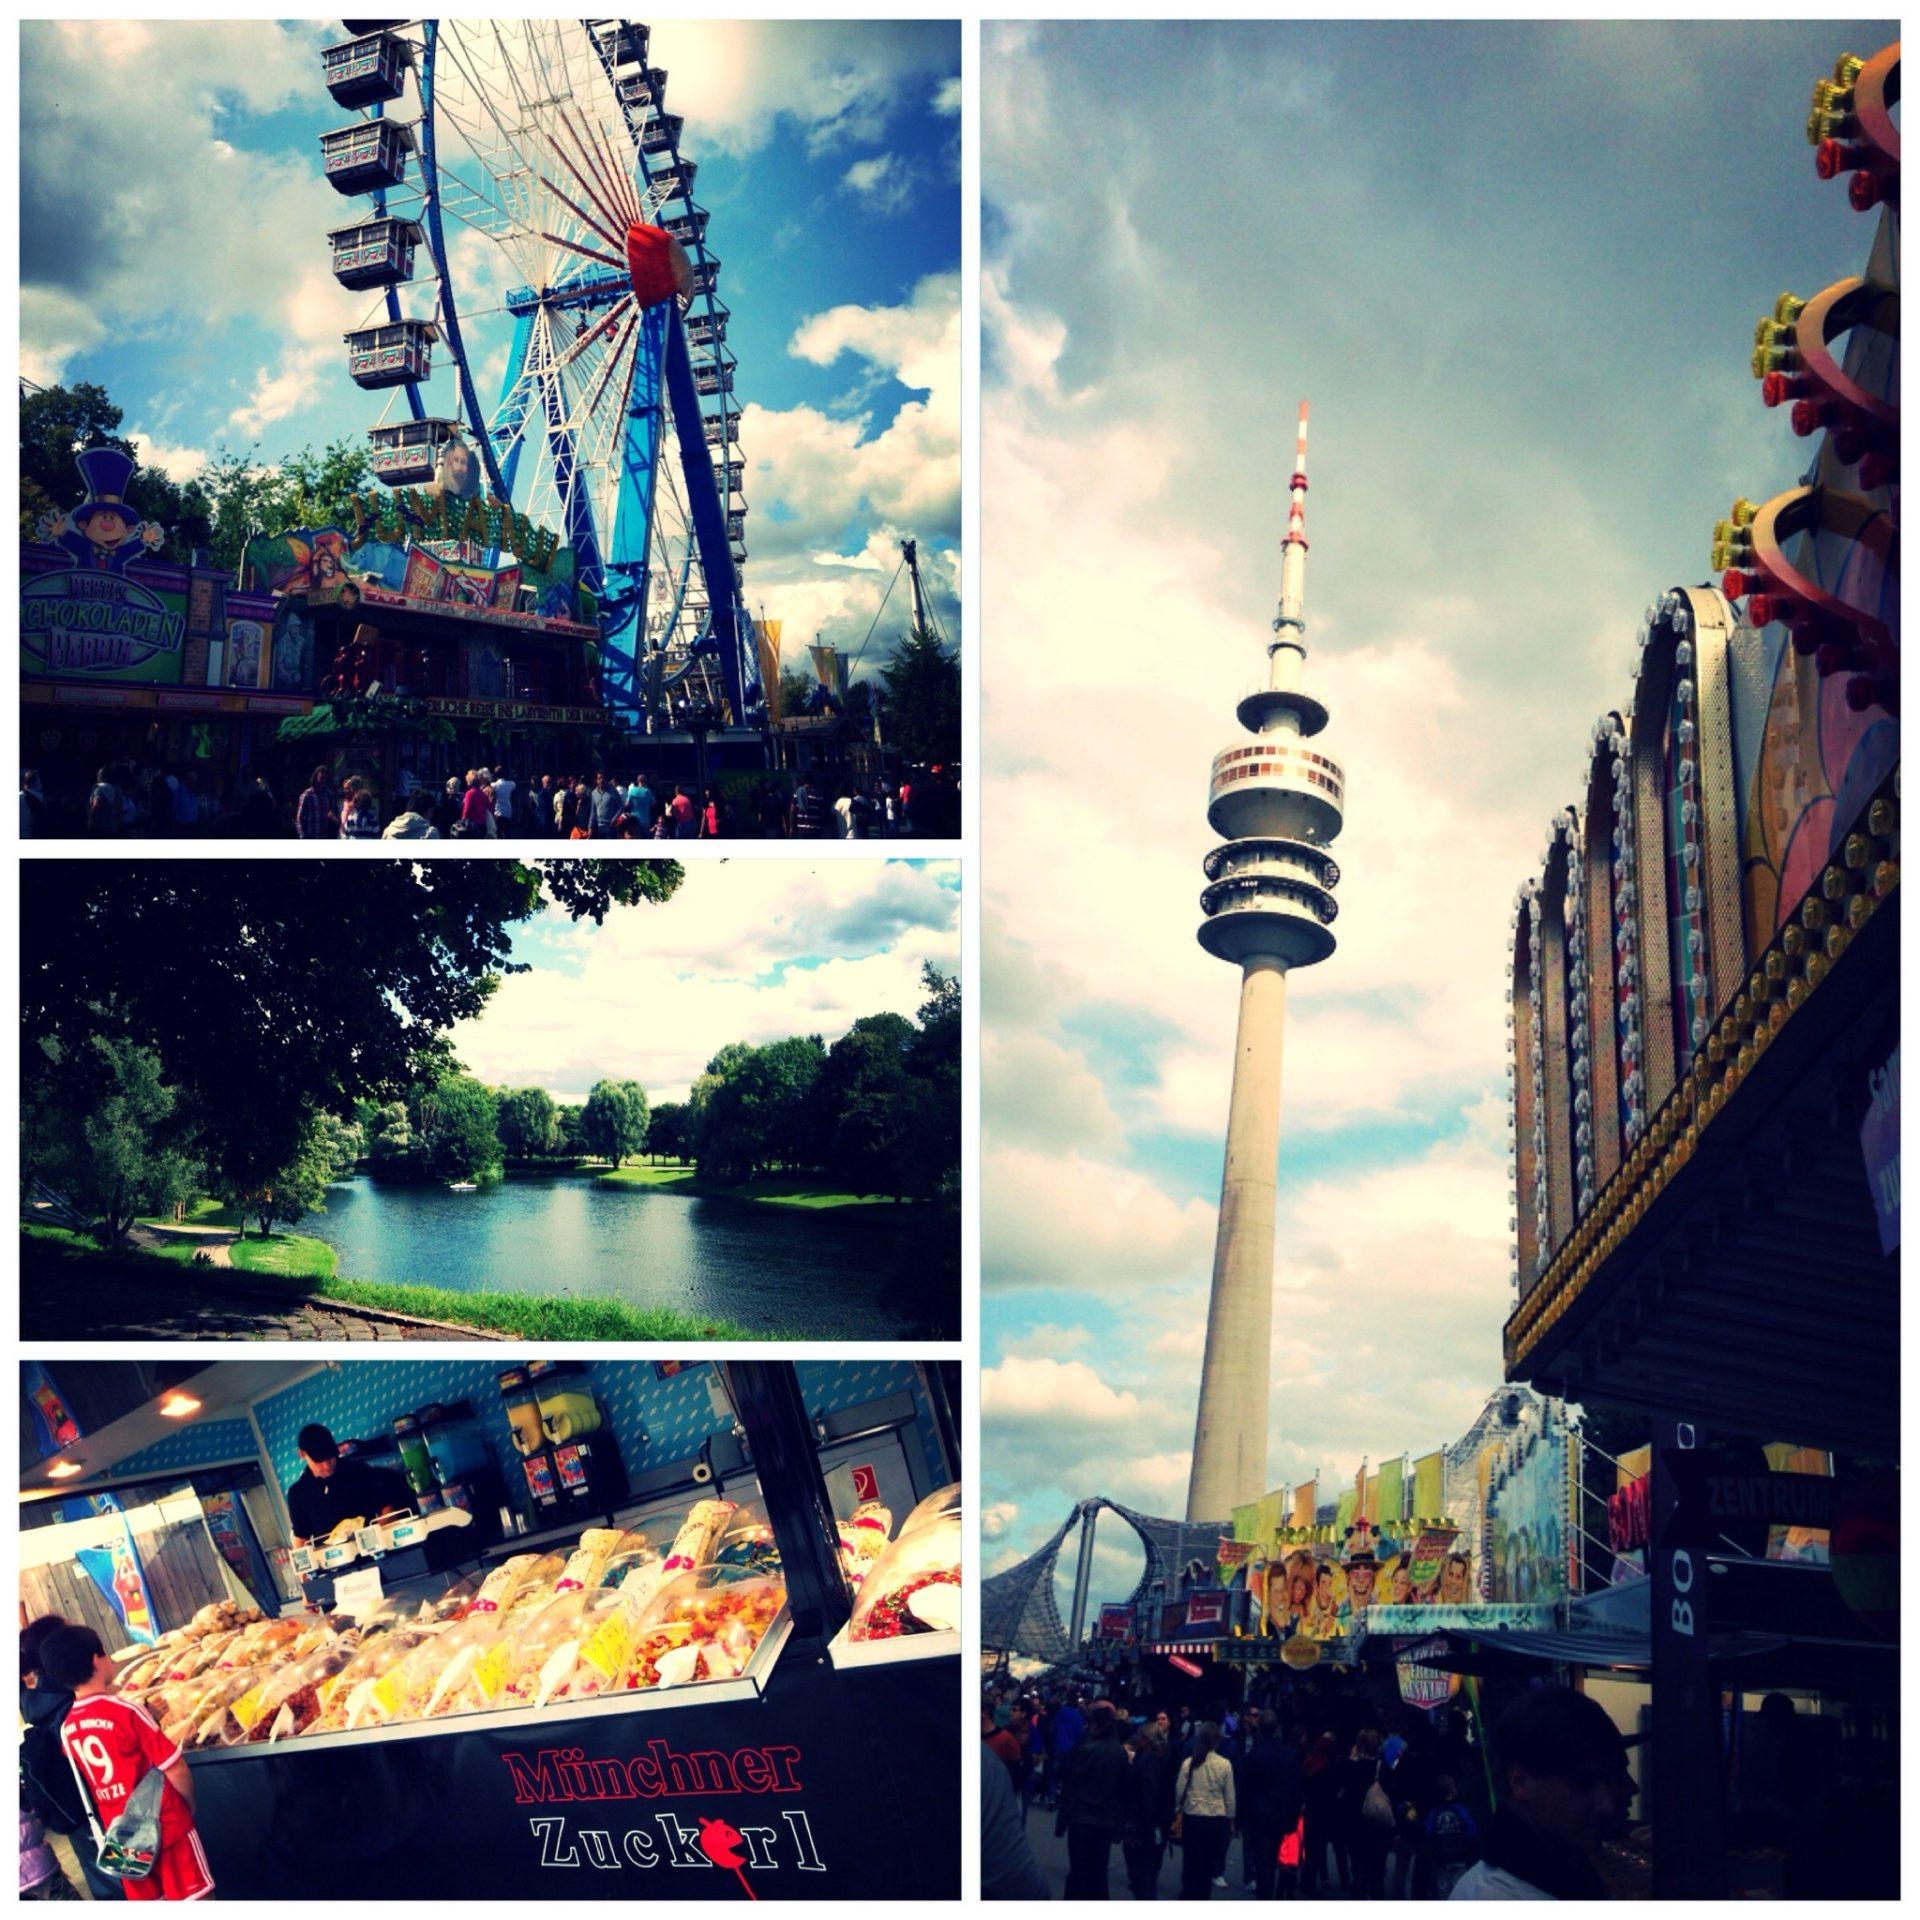 Volksfest sommerfestival olympiapark muenchen